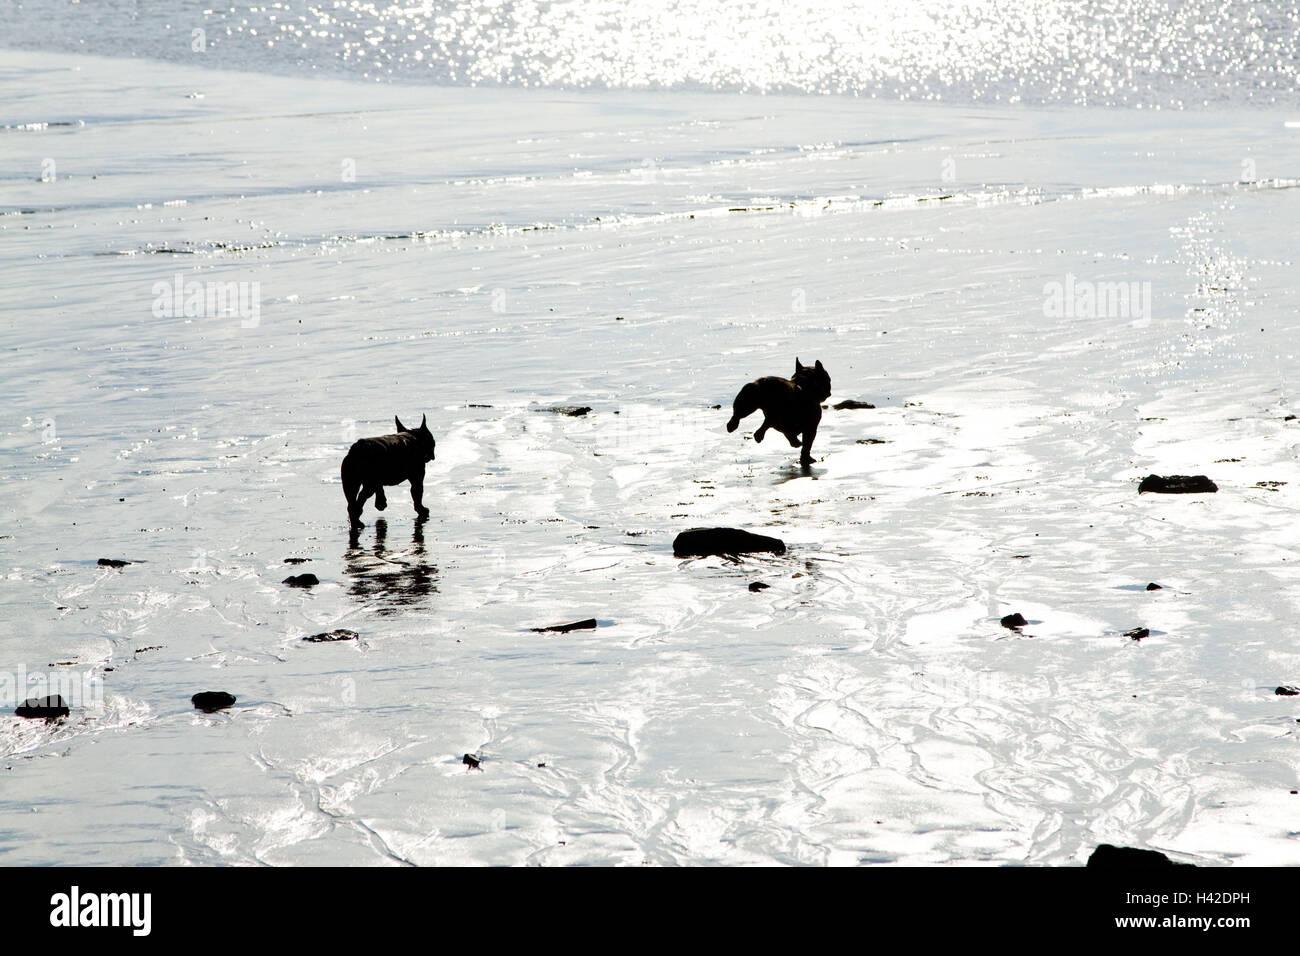 pedigree dogs stockfotos pedigree dogs bilder alamy. Black Bedroom Furniture Sets. Home Design Ideas